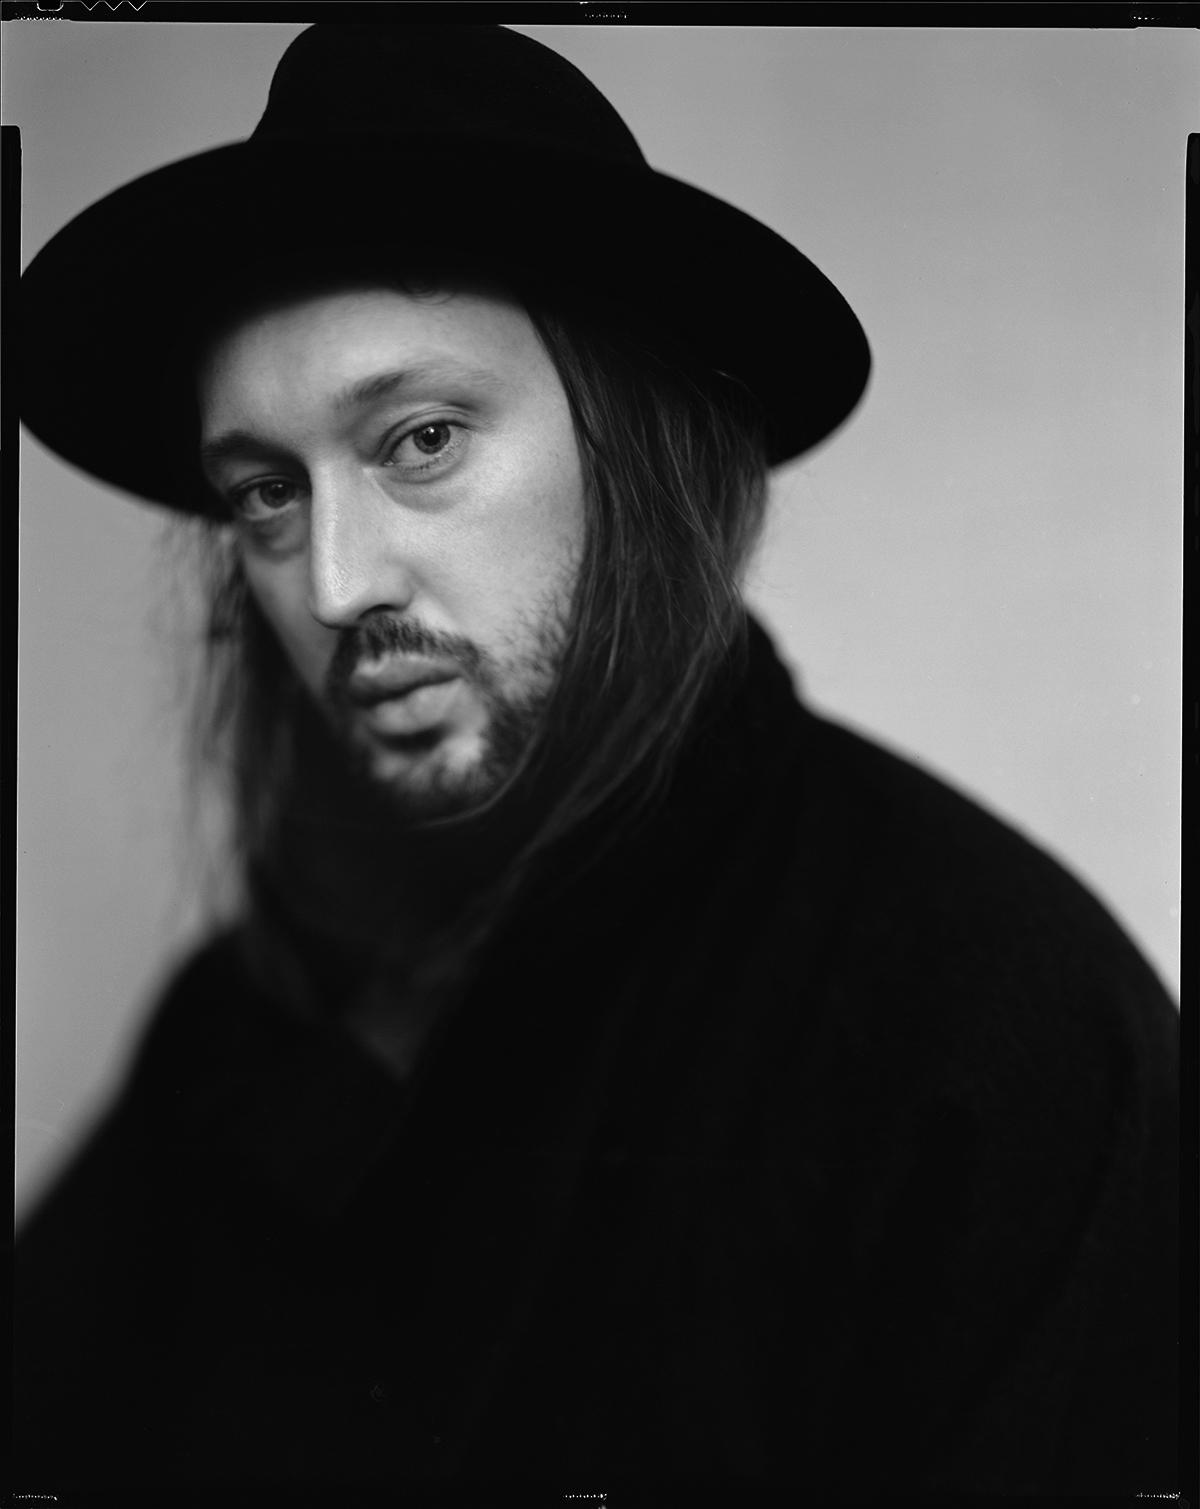 Gregory Aune, Photographer, NYC 2013